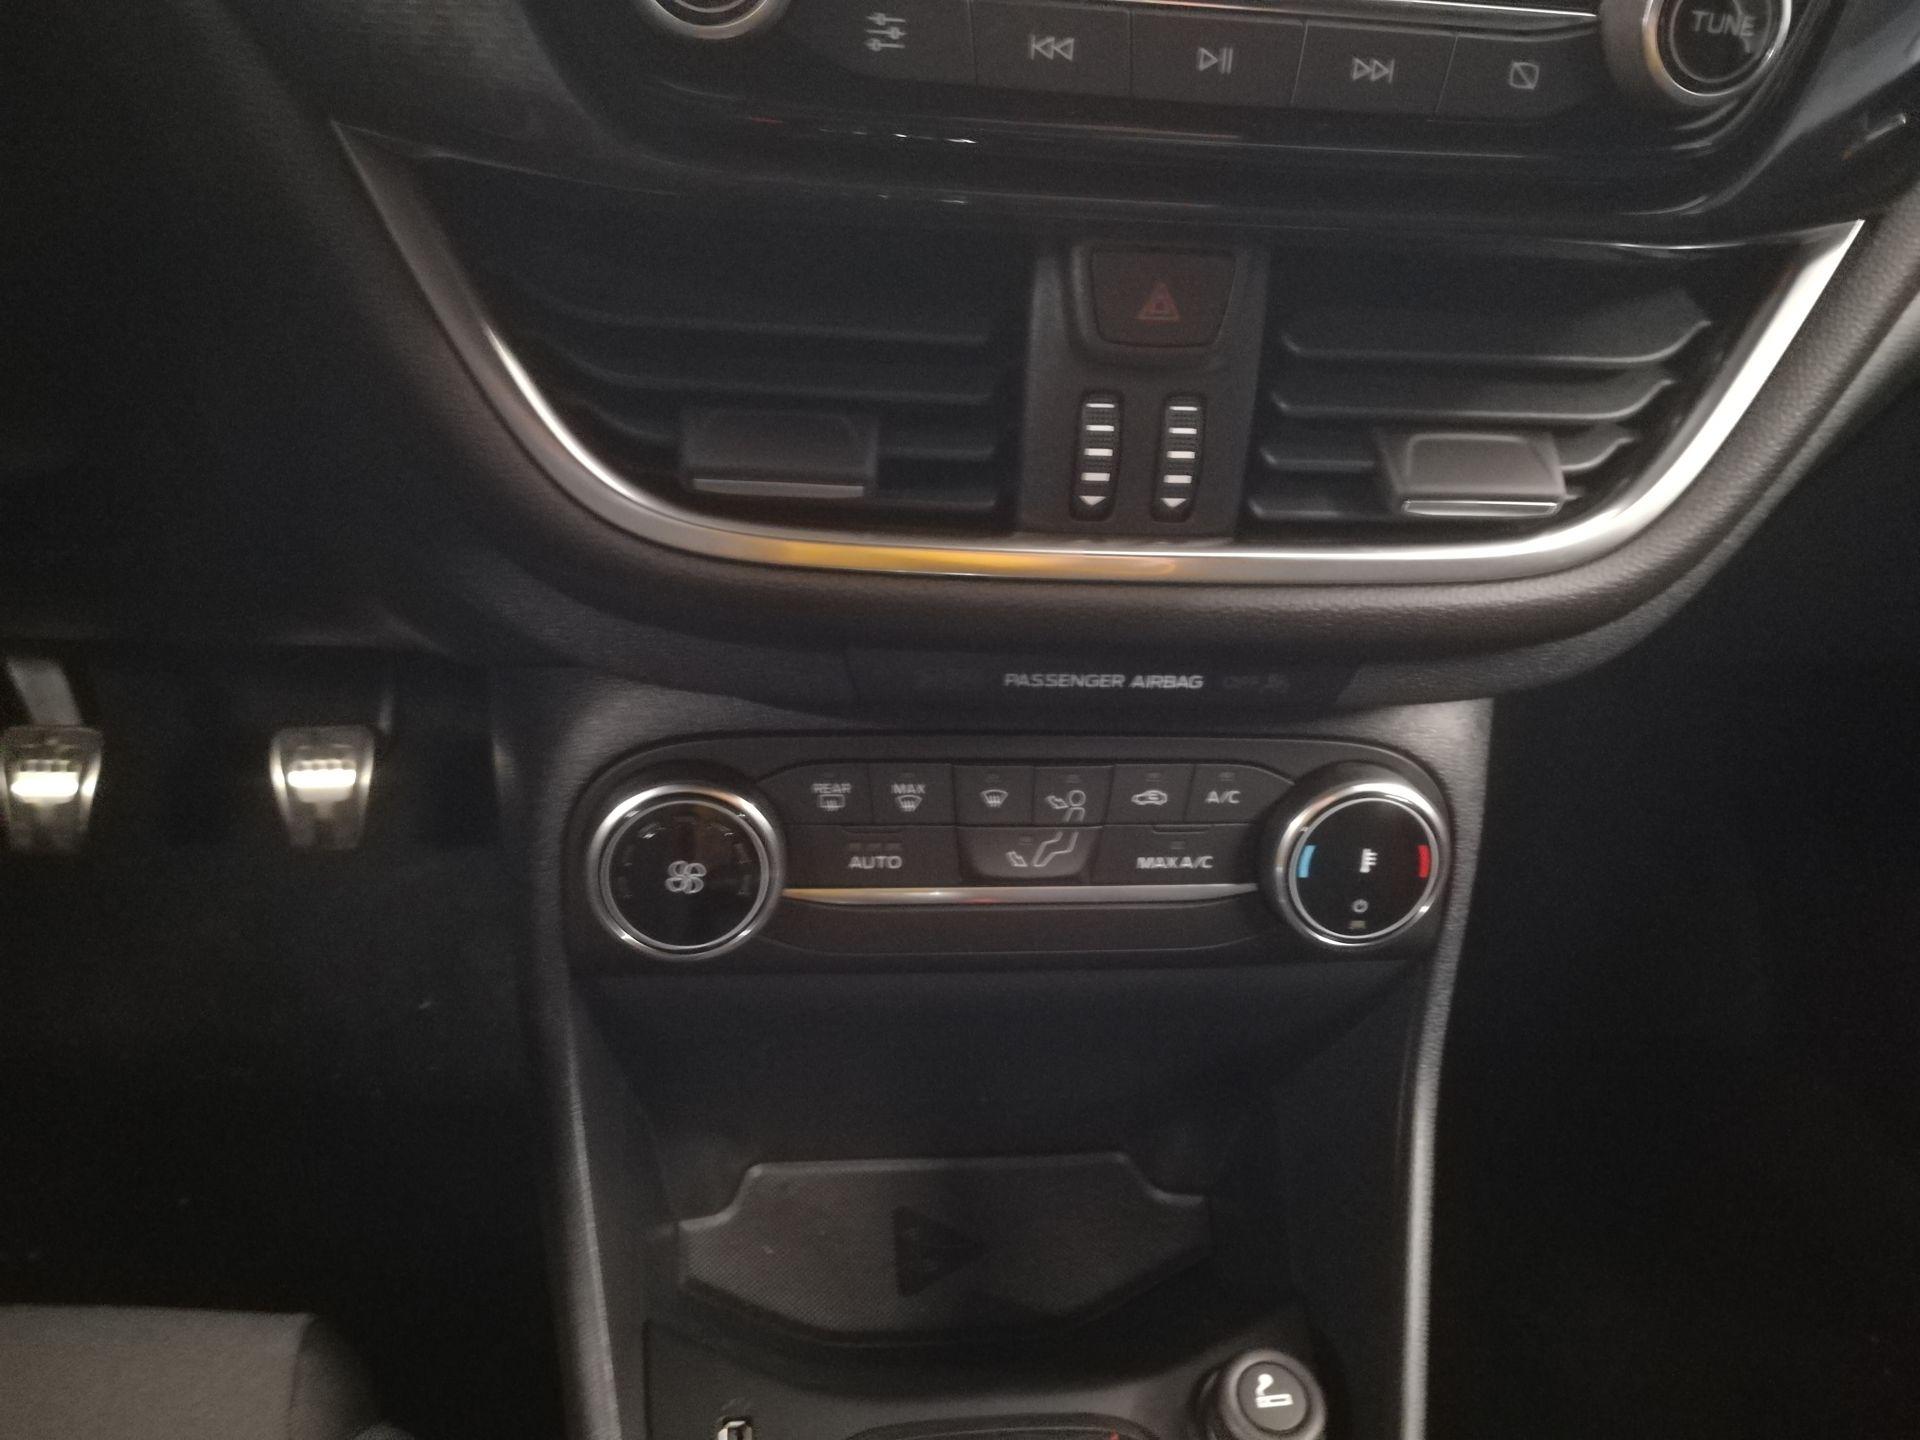 Ford Fiesta 1.0 EcoBoost 70kW (95CV) ST-Line S/S 5p